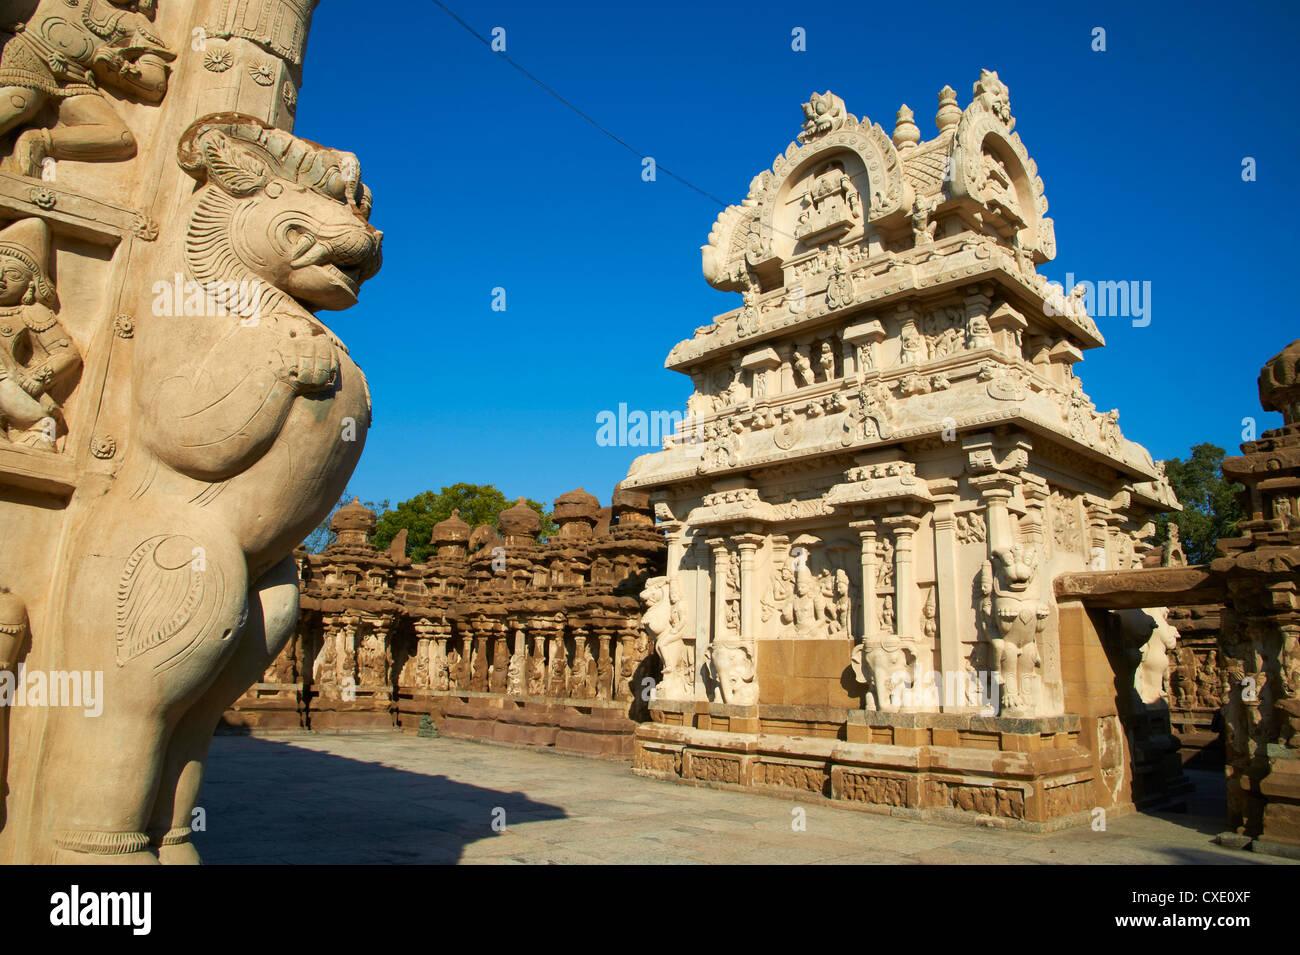 Temple Kailasanatha datant du 8e siècle, Kanchipuram, Tamil Nadu, Inde, Asie Banque D'Images